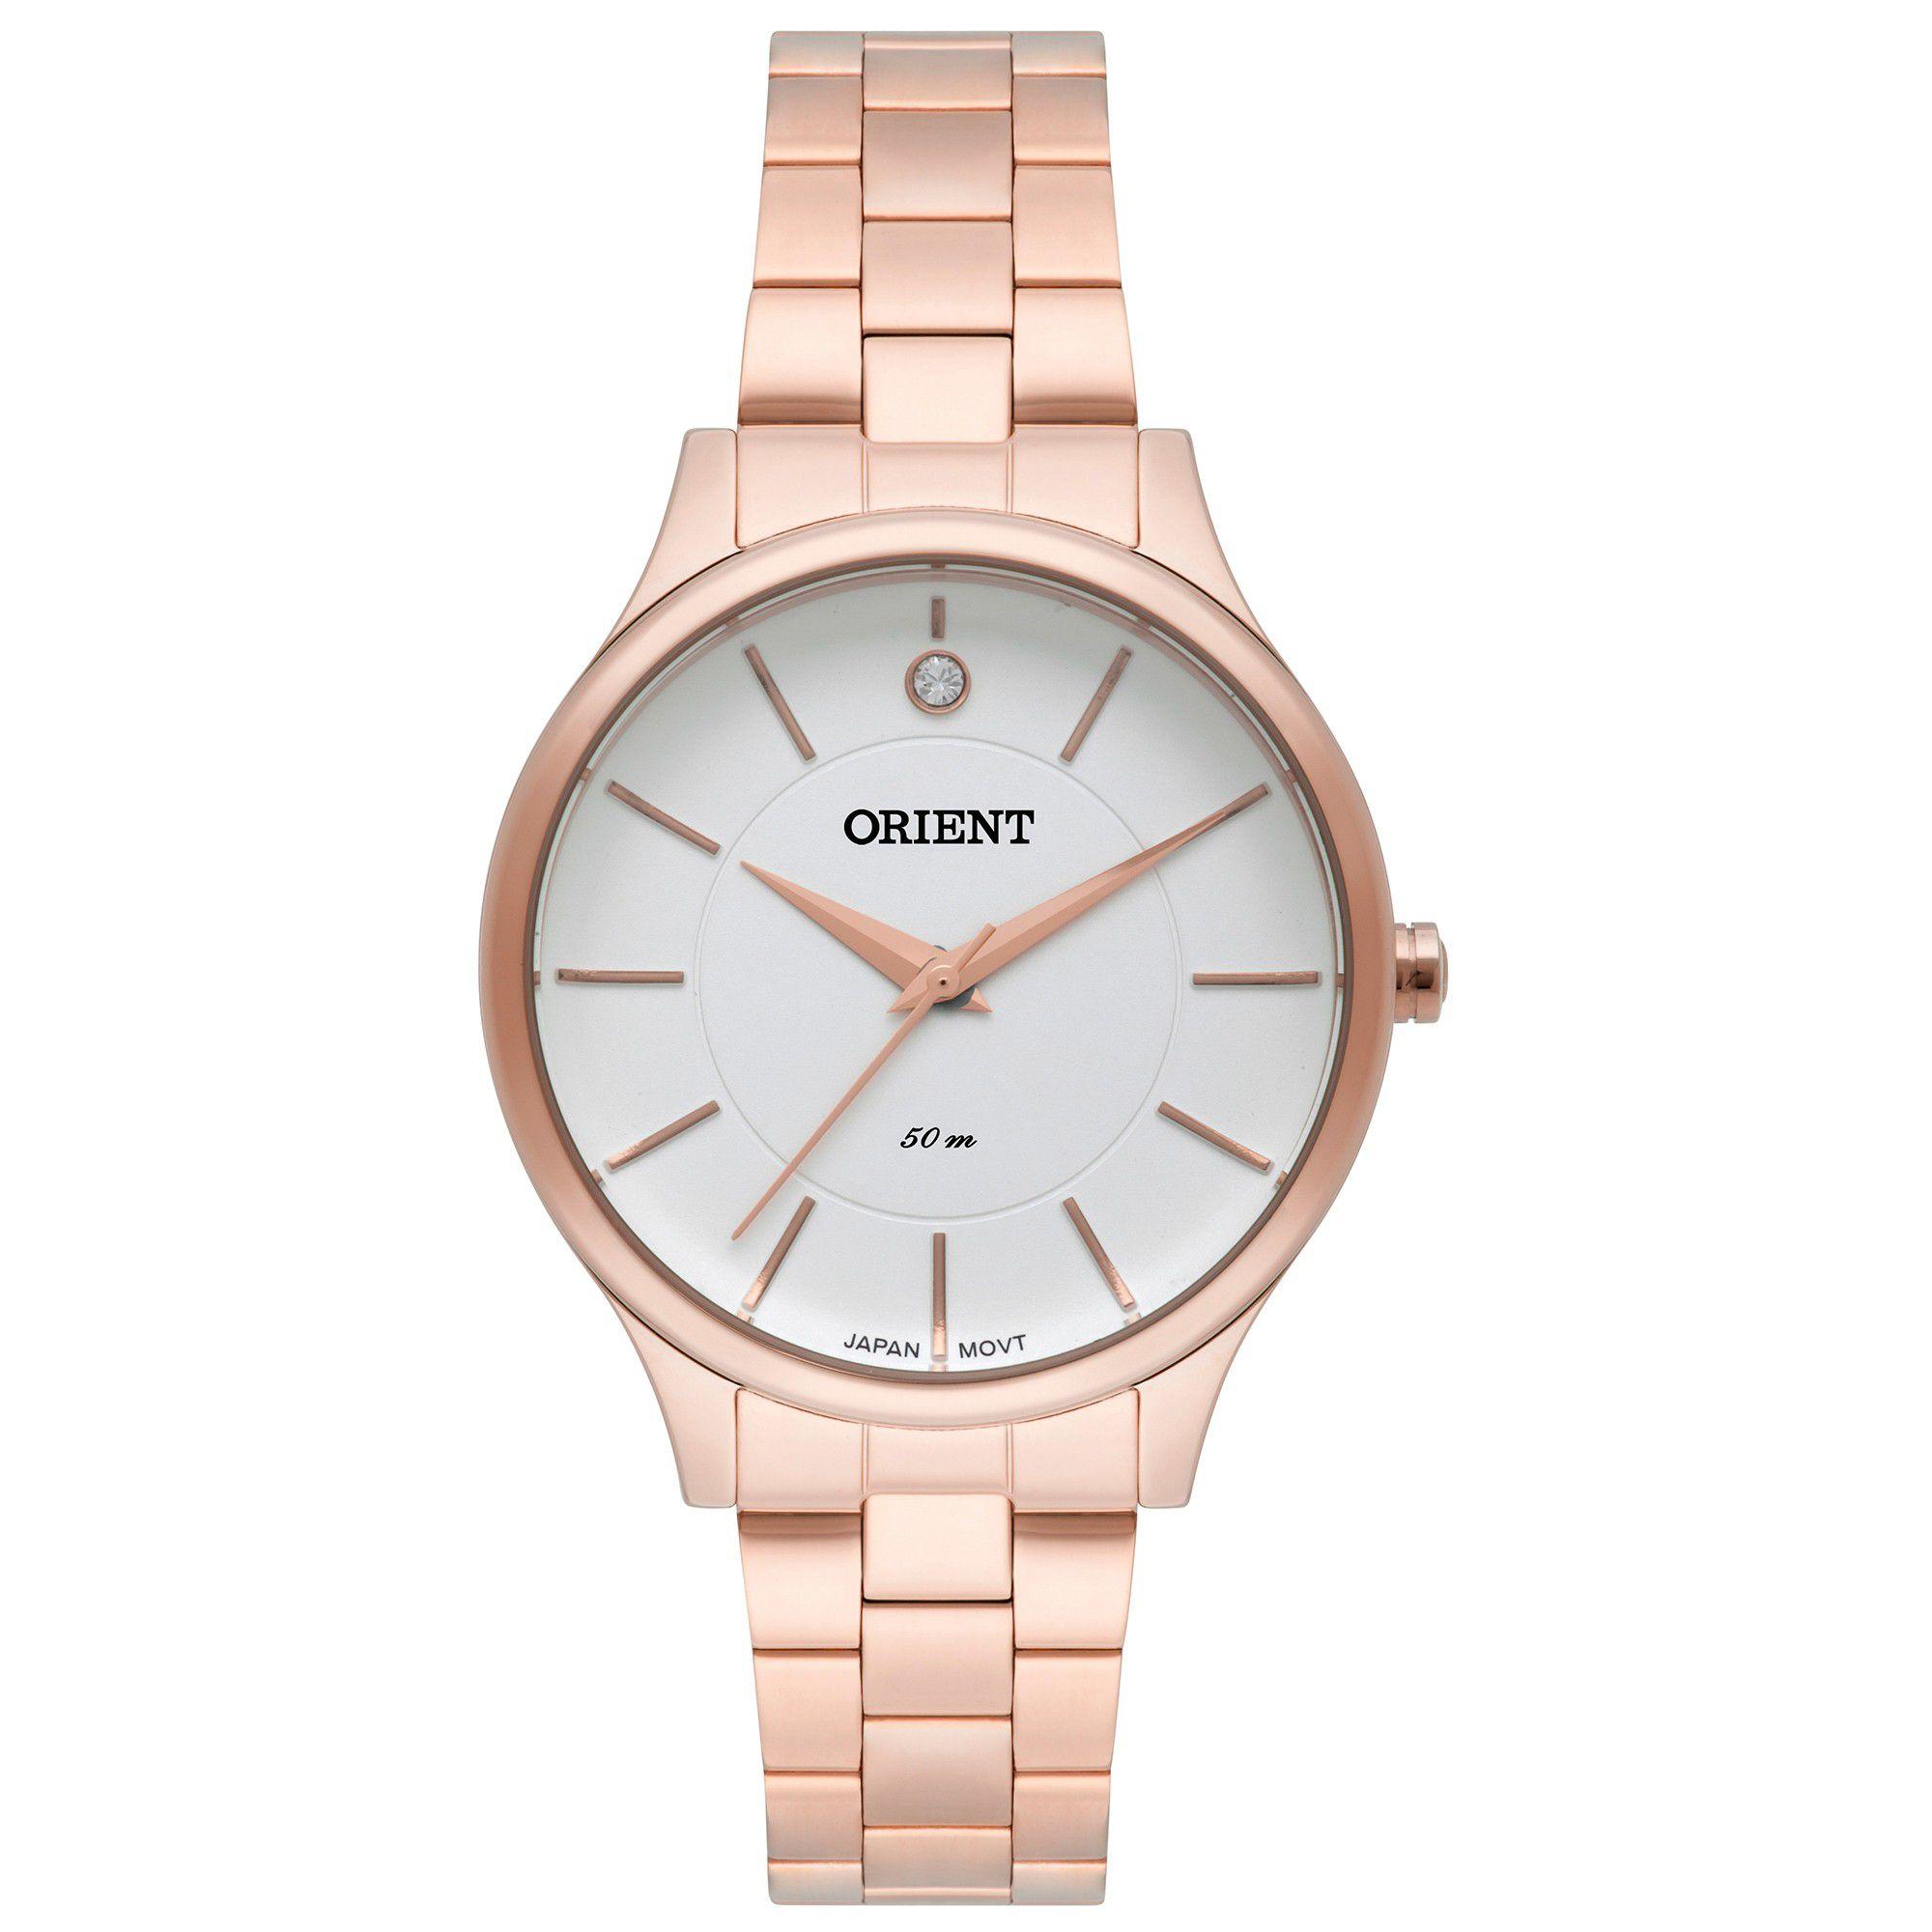 Relógio Feminino Orient FRSS0036 S1RX